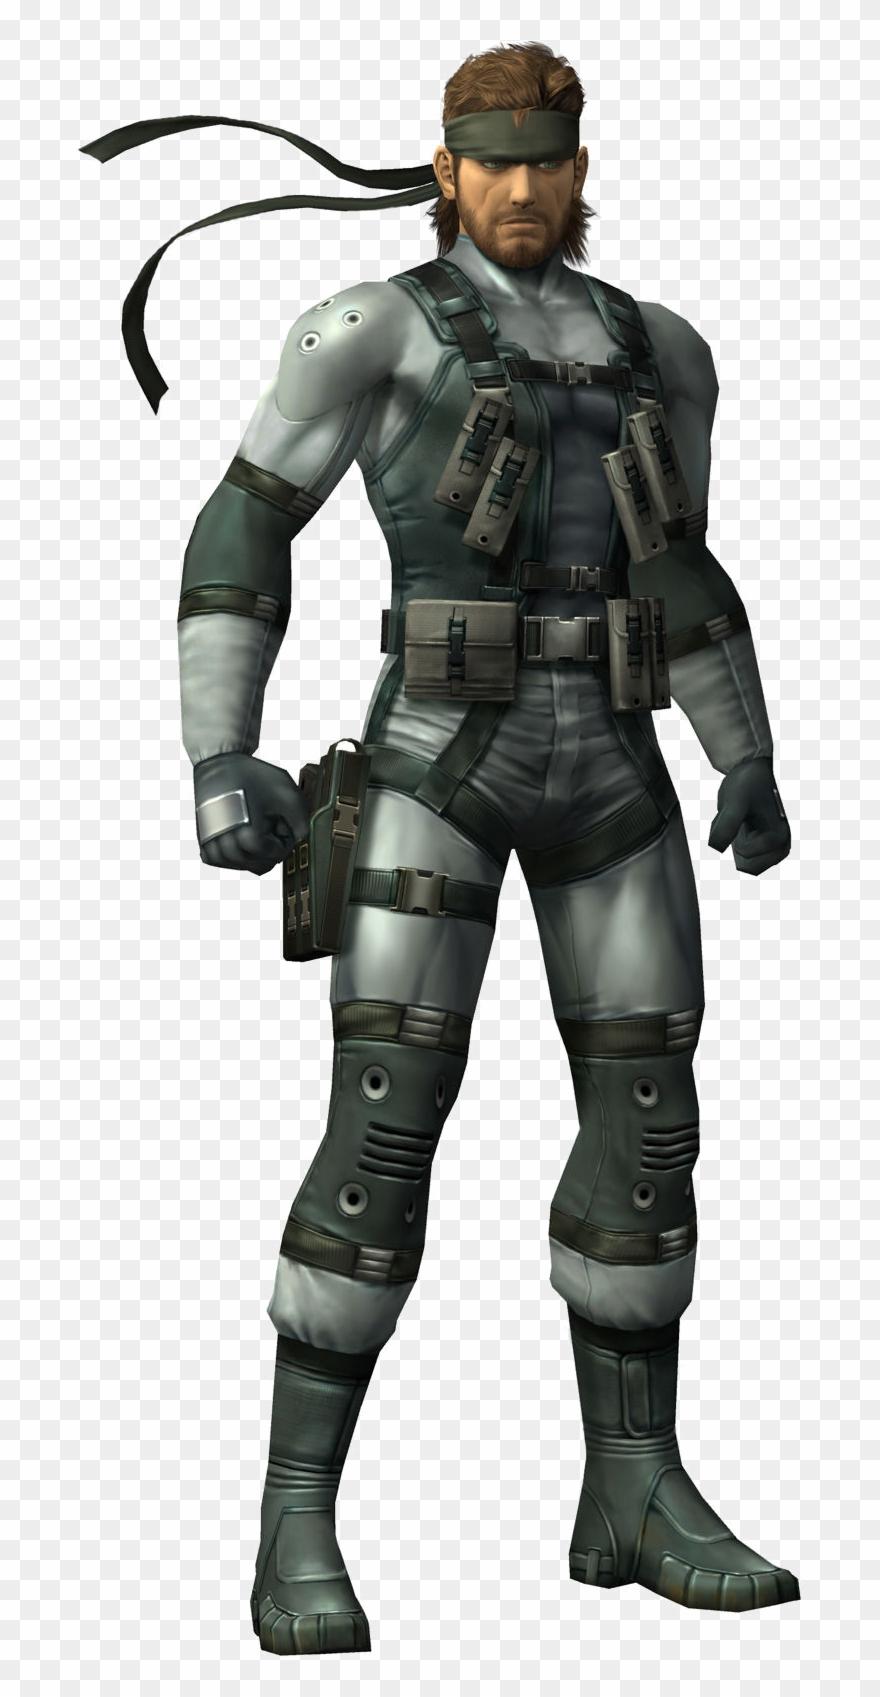 Snake Metal Gear Png.